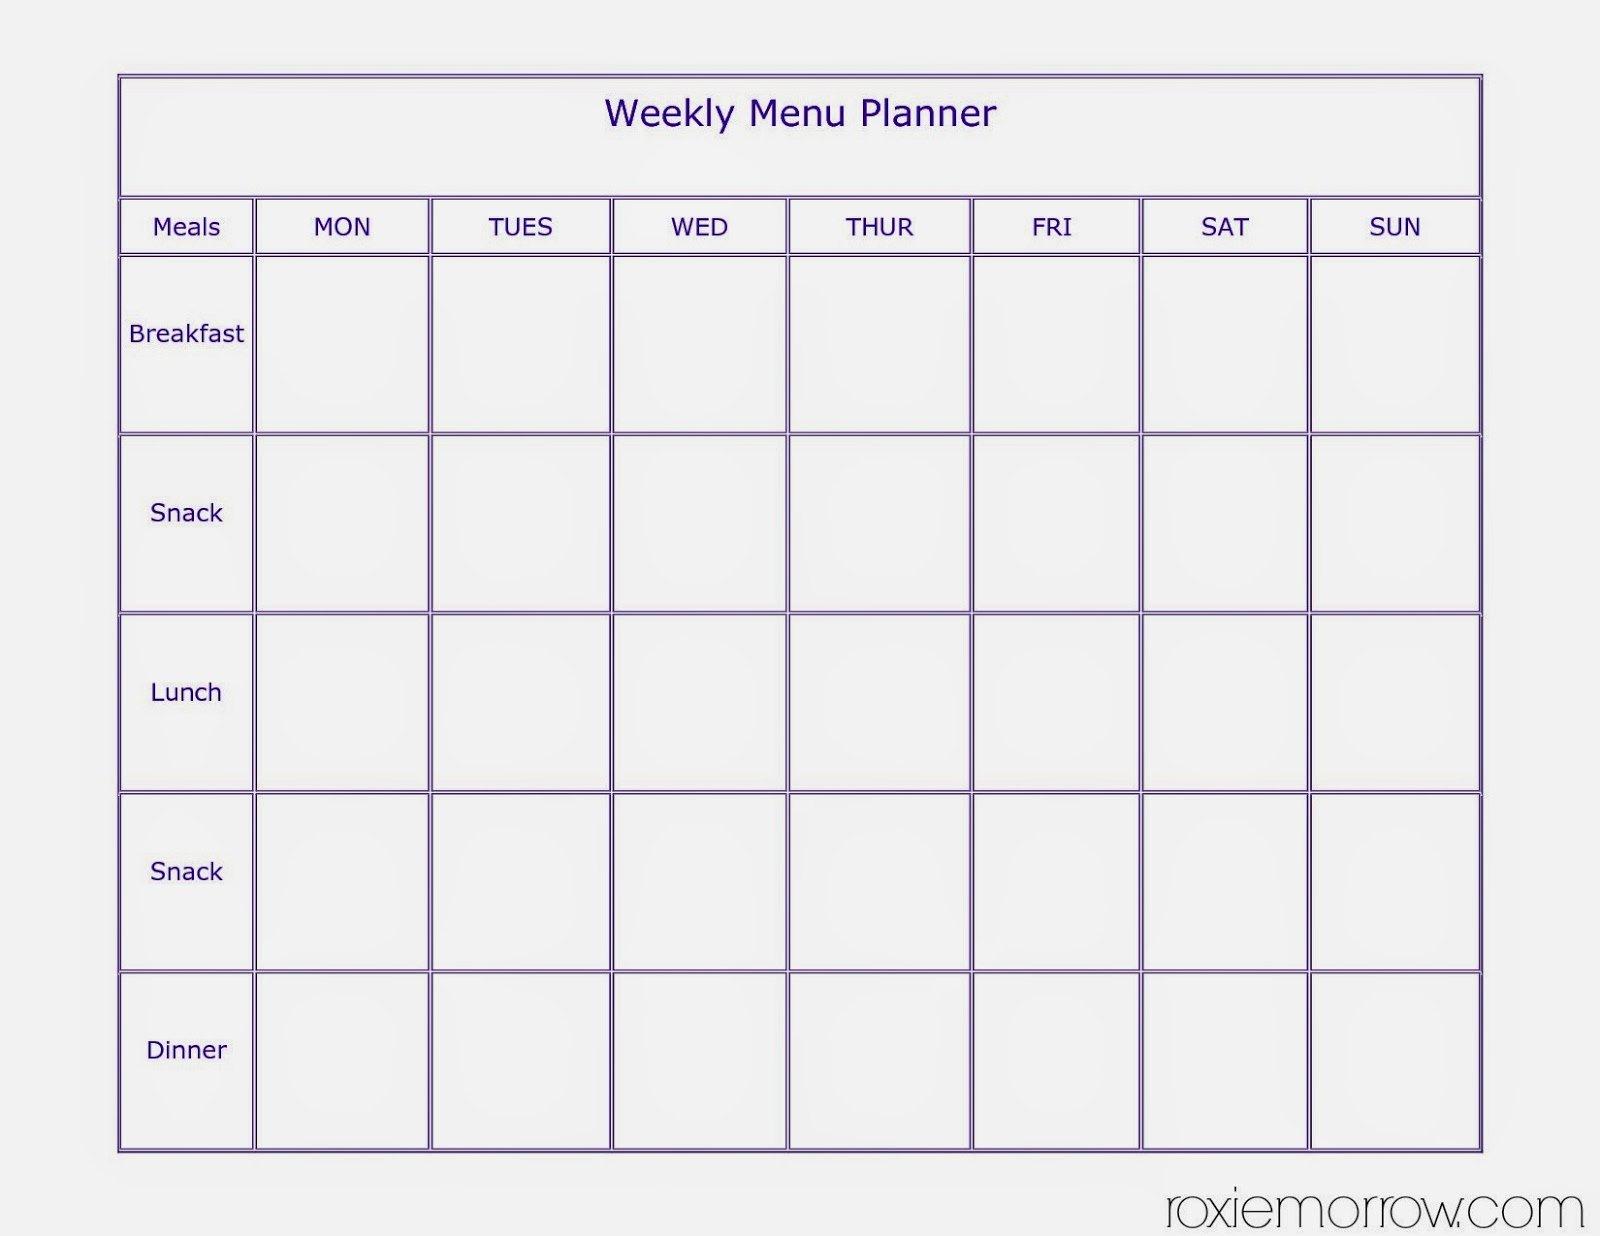 7 Day Menu Planner Tierianhenry